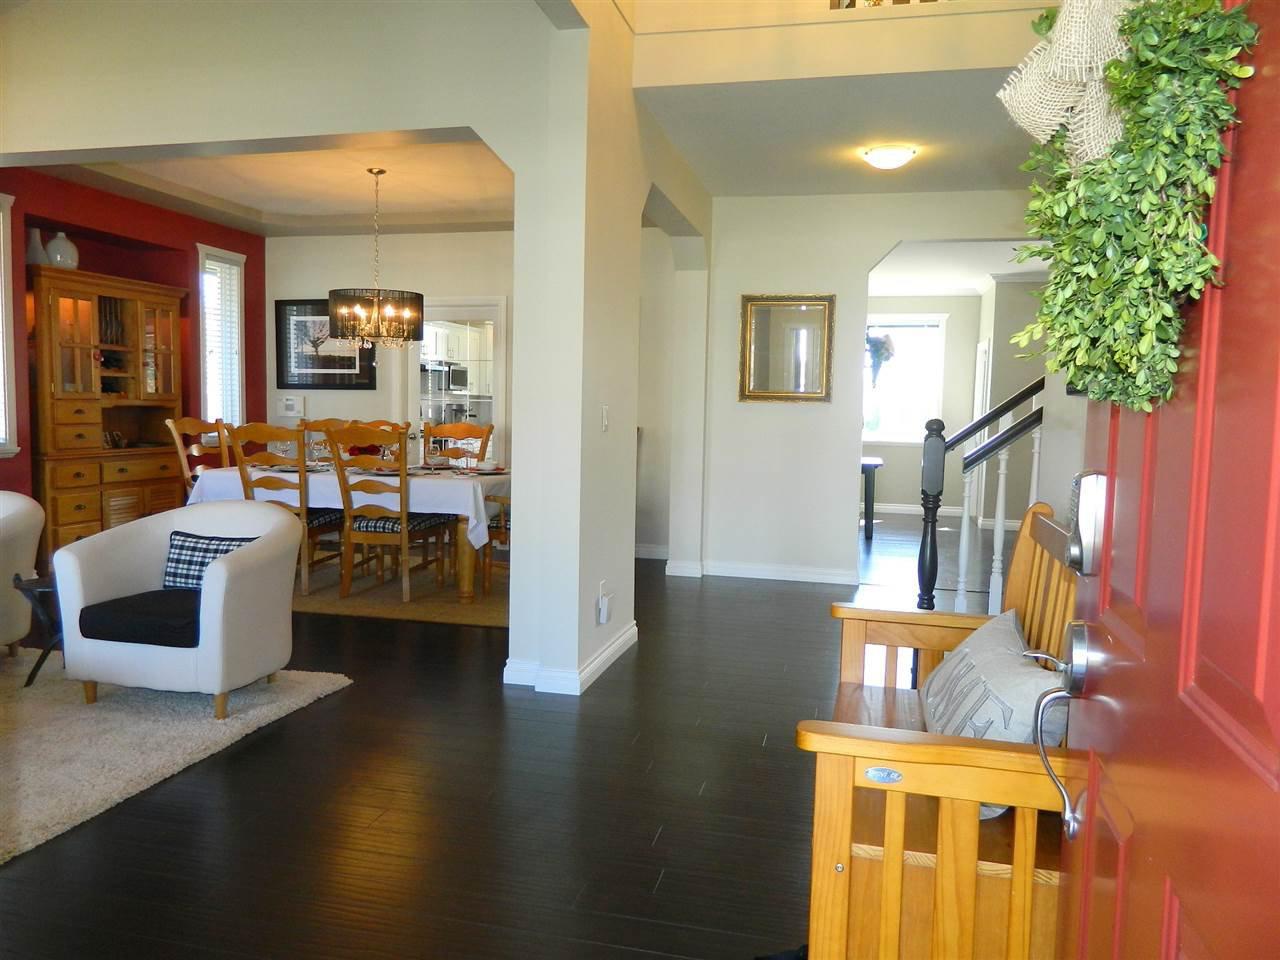 Photo 3: Photos: 24332 104 AVENUE in Maple Ridge: Albion House for sale : MLS®# R2051414